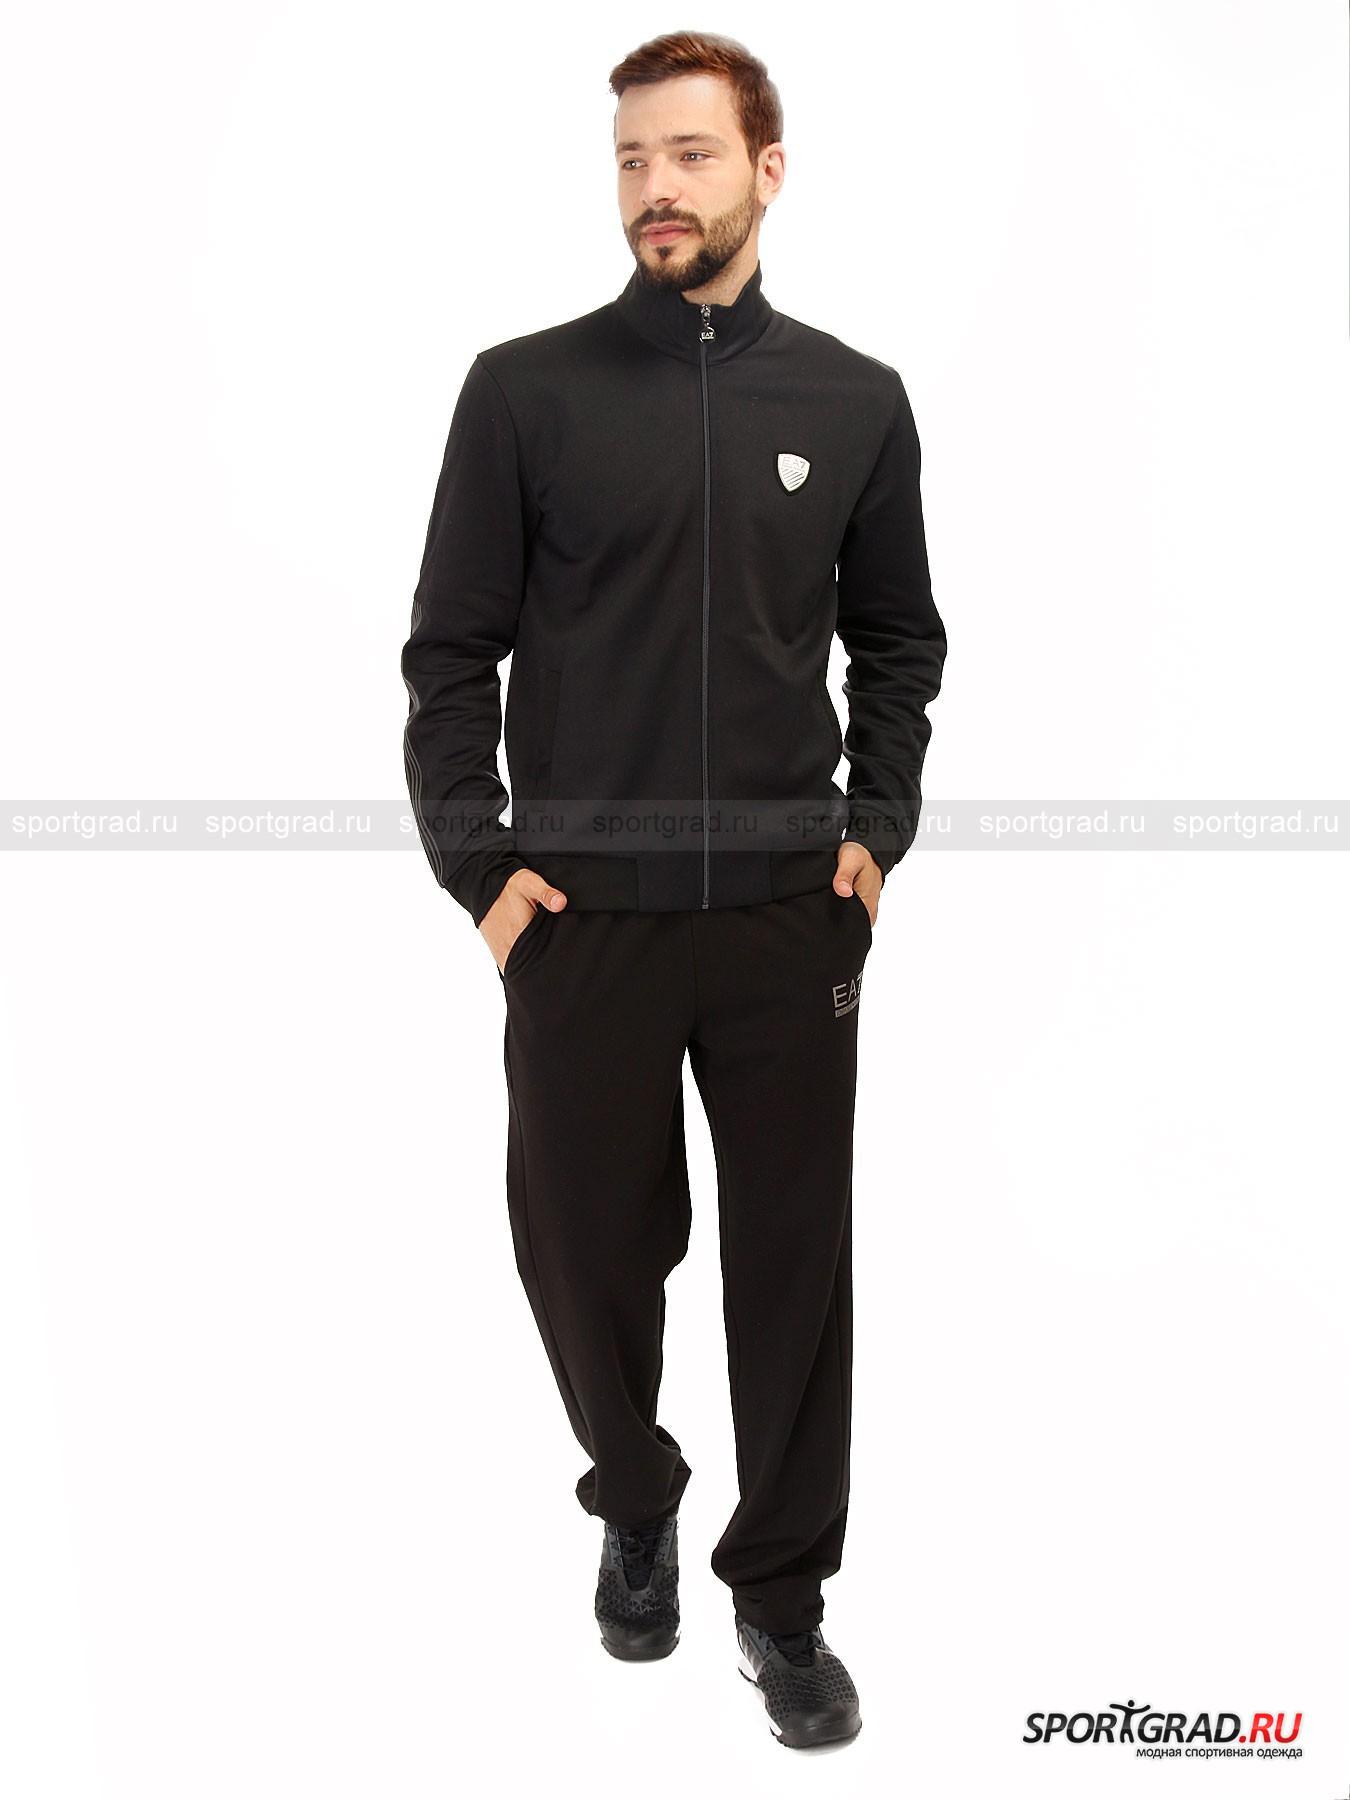 Толстовка мужская Train Soccer Sweatshirt EMPORIO ARMANI от Спортград